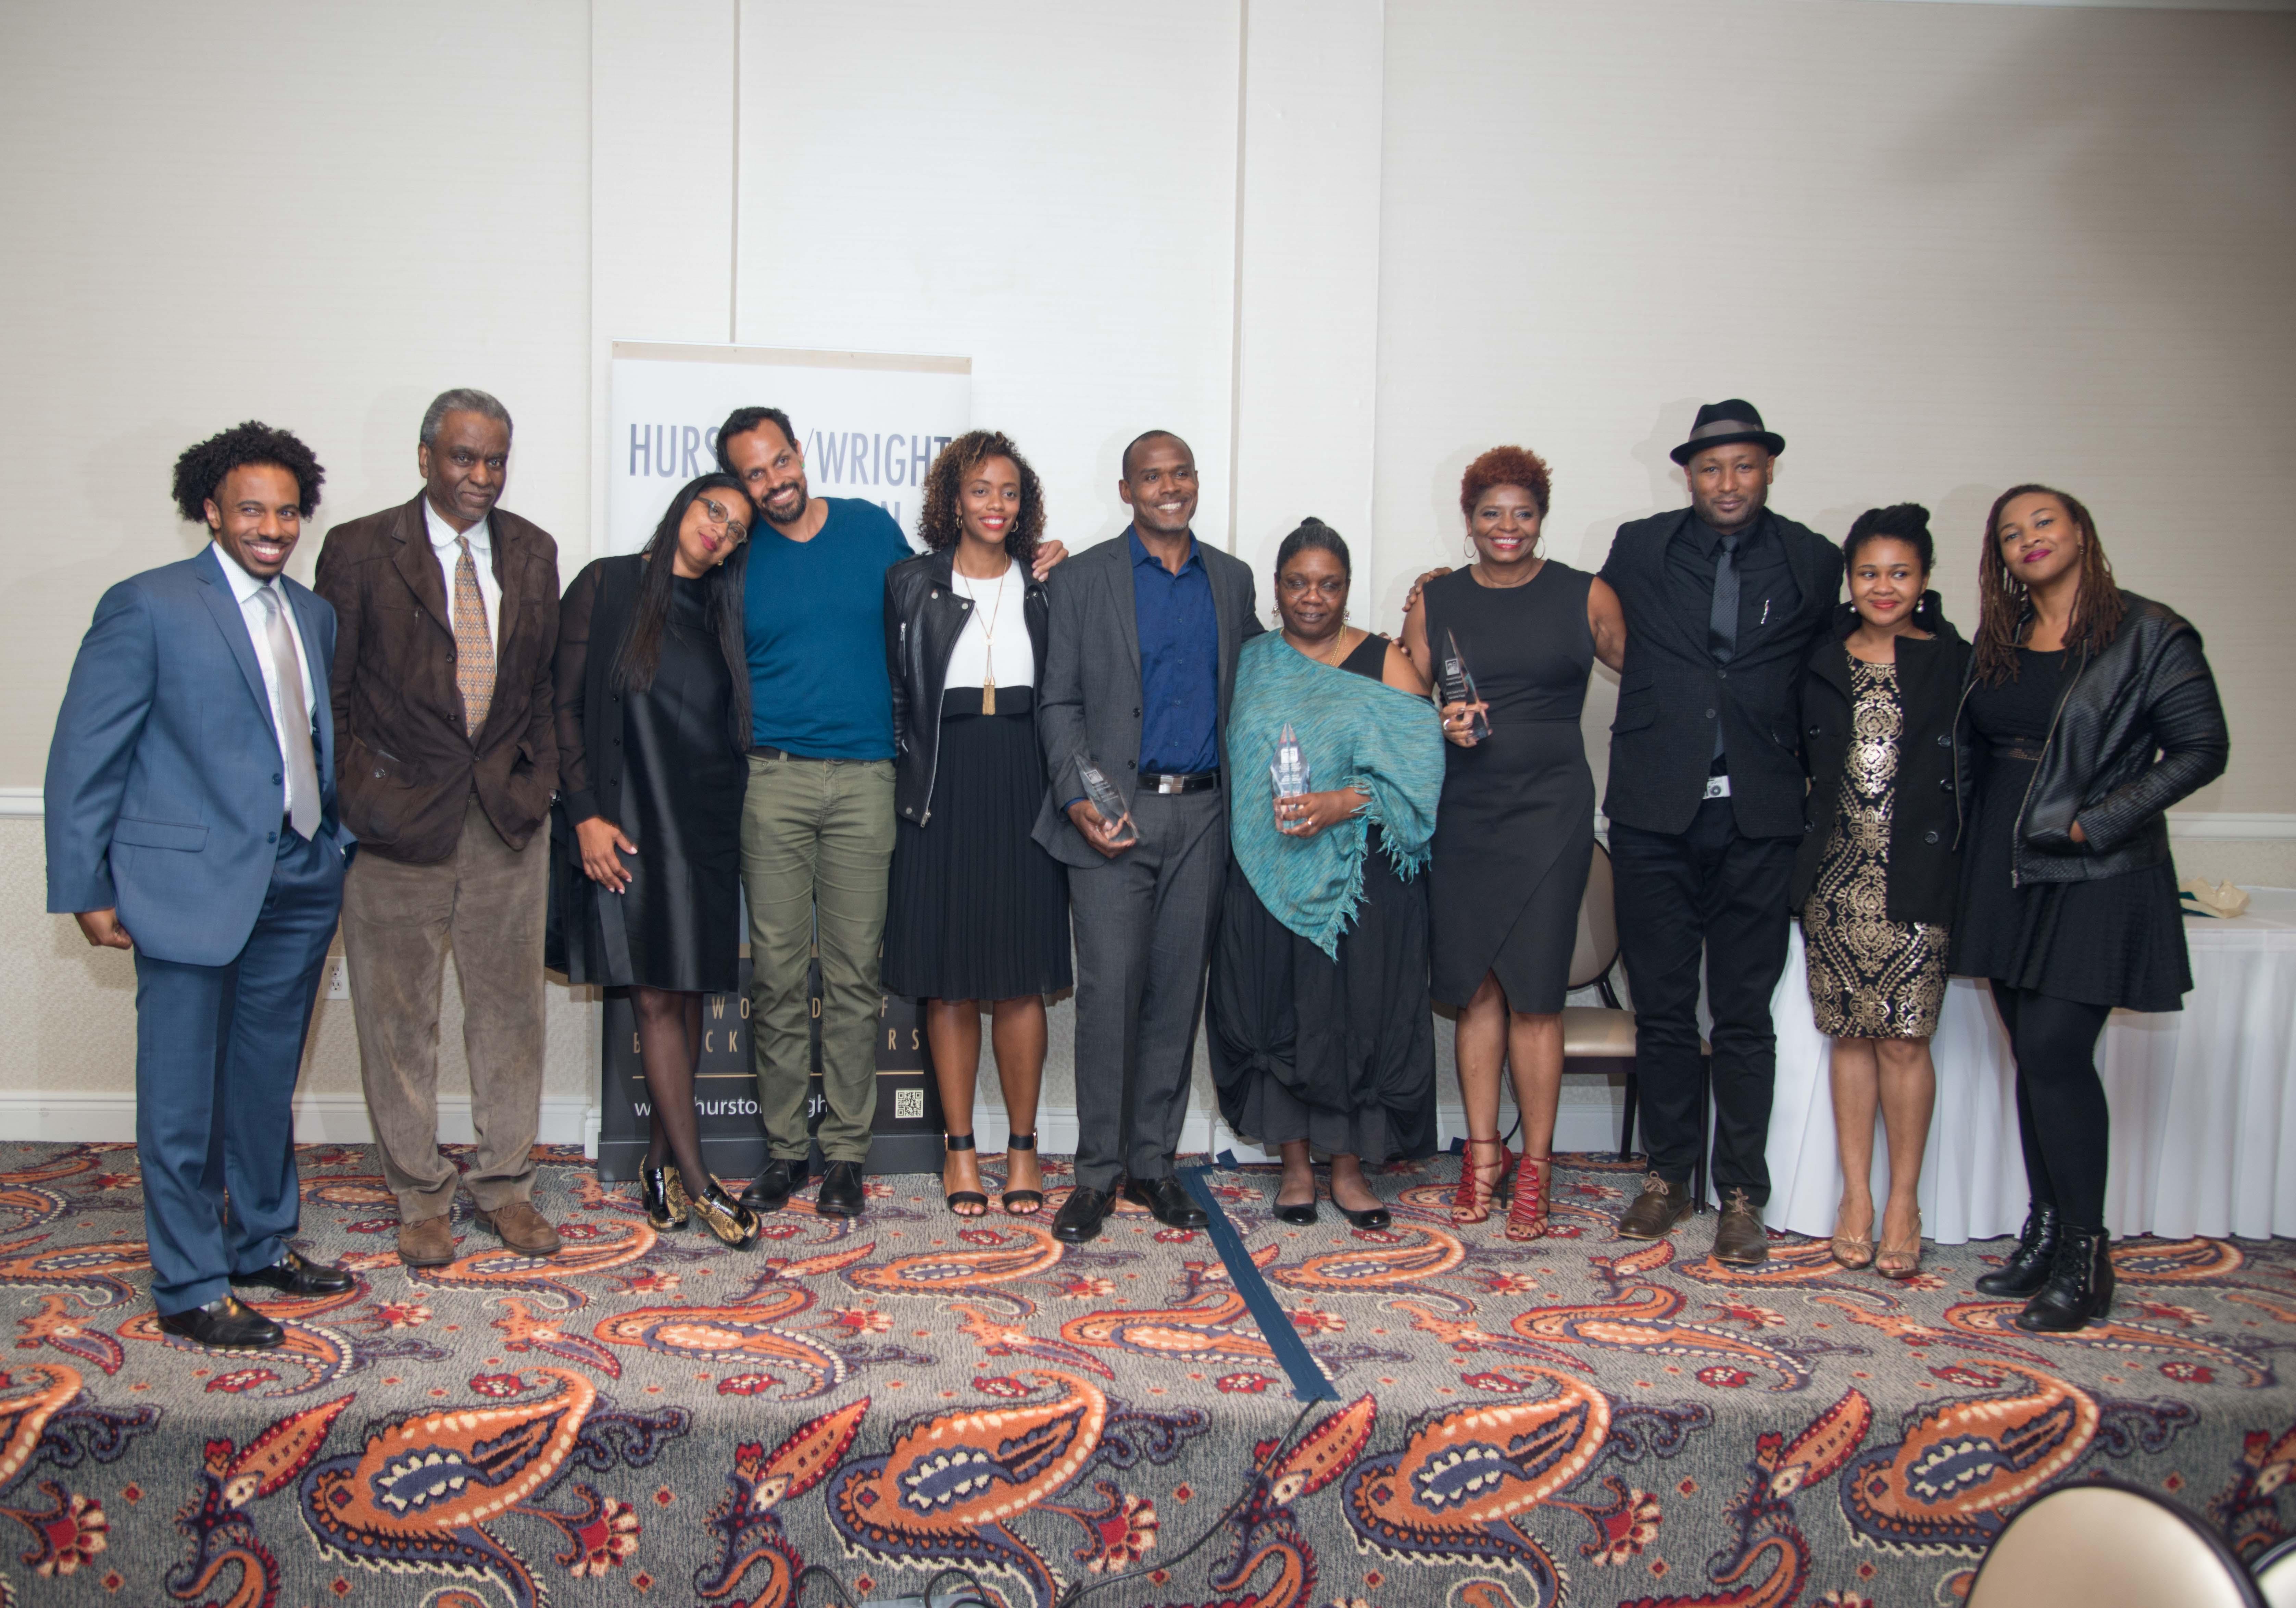 2016 Legacy Award Honorees